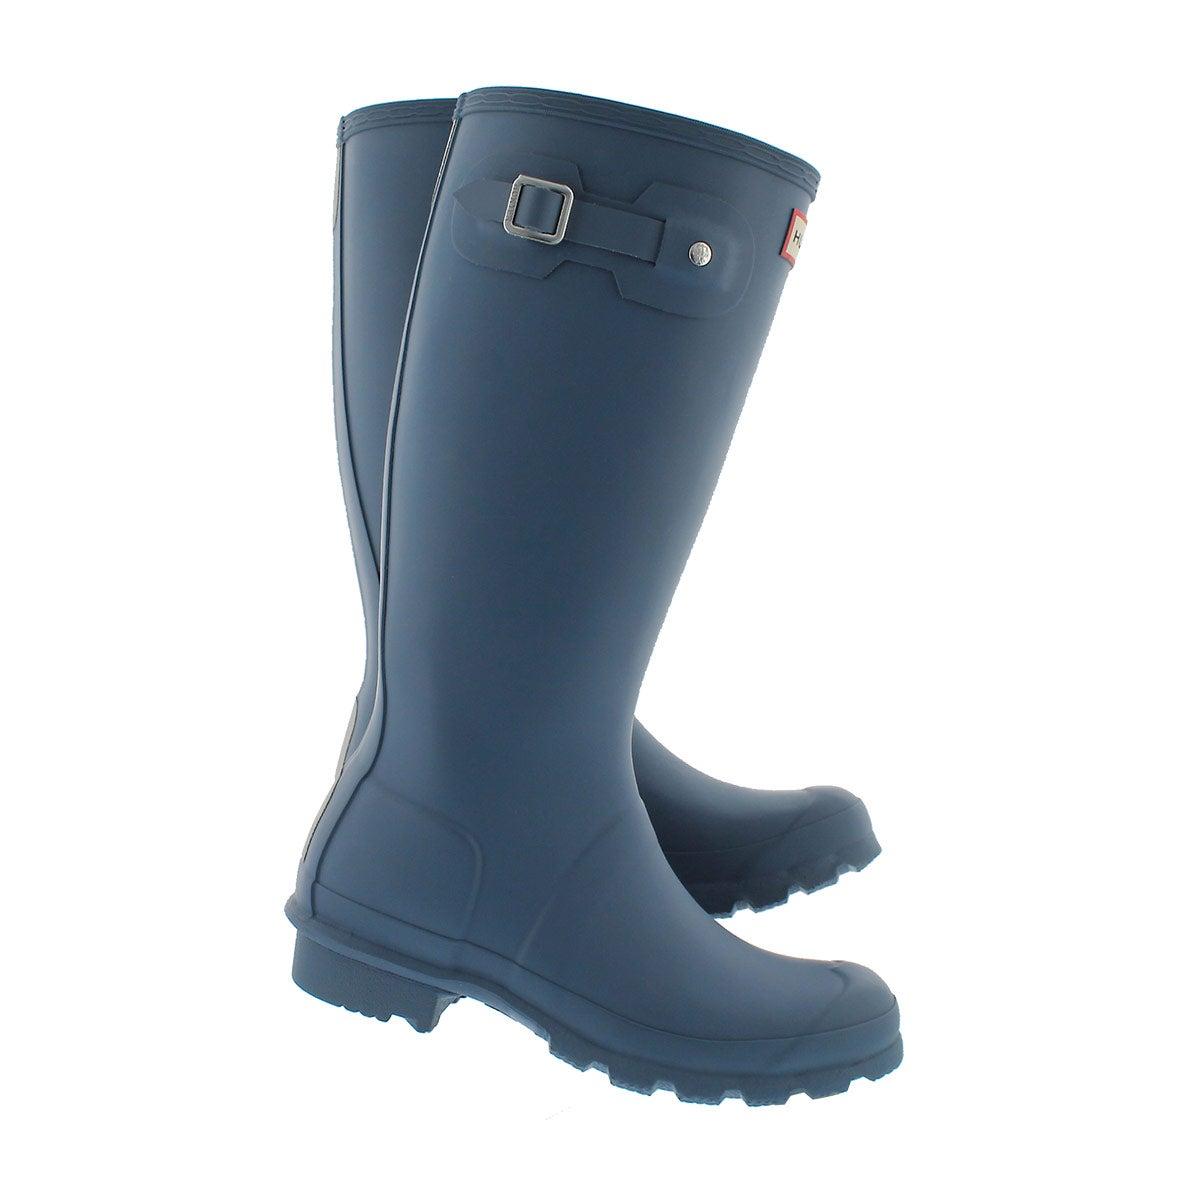 Grls Original Young earth blue rain boot